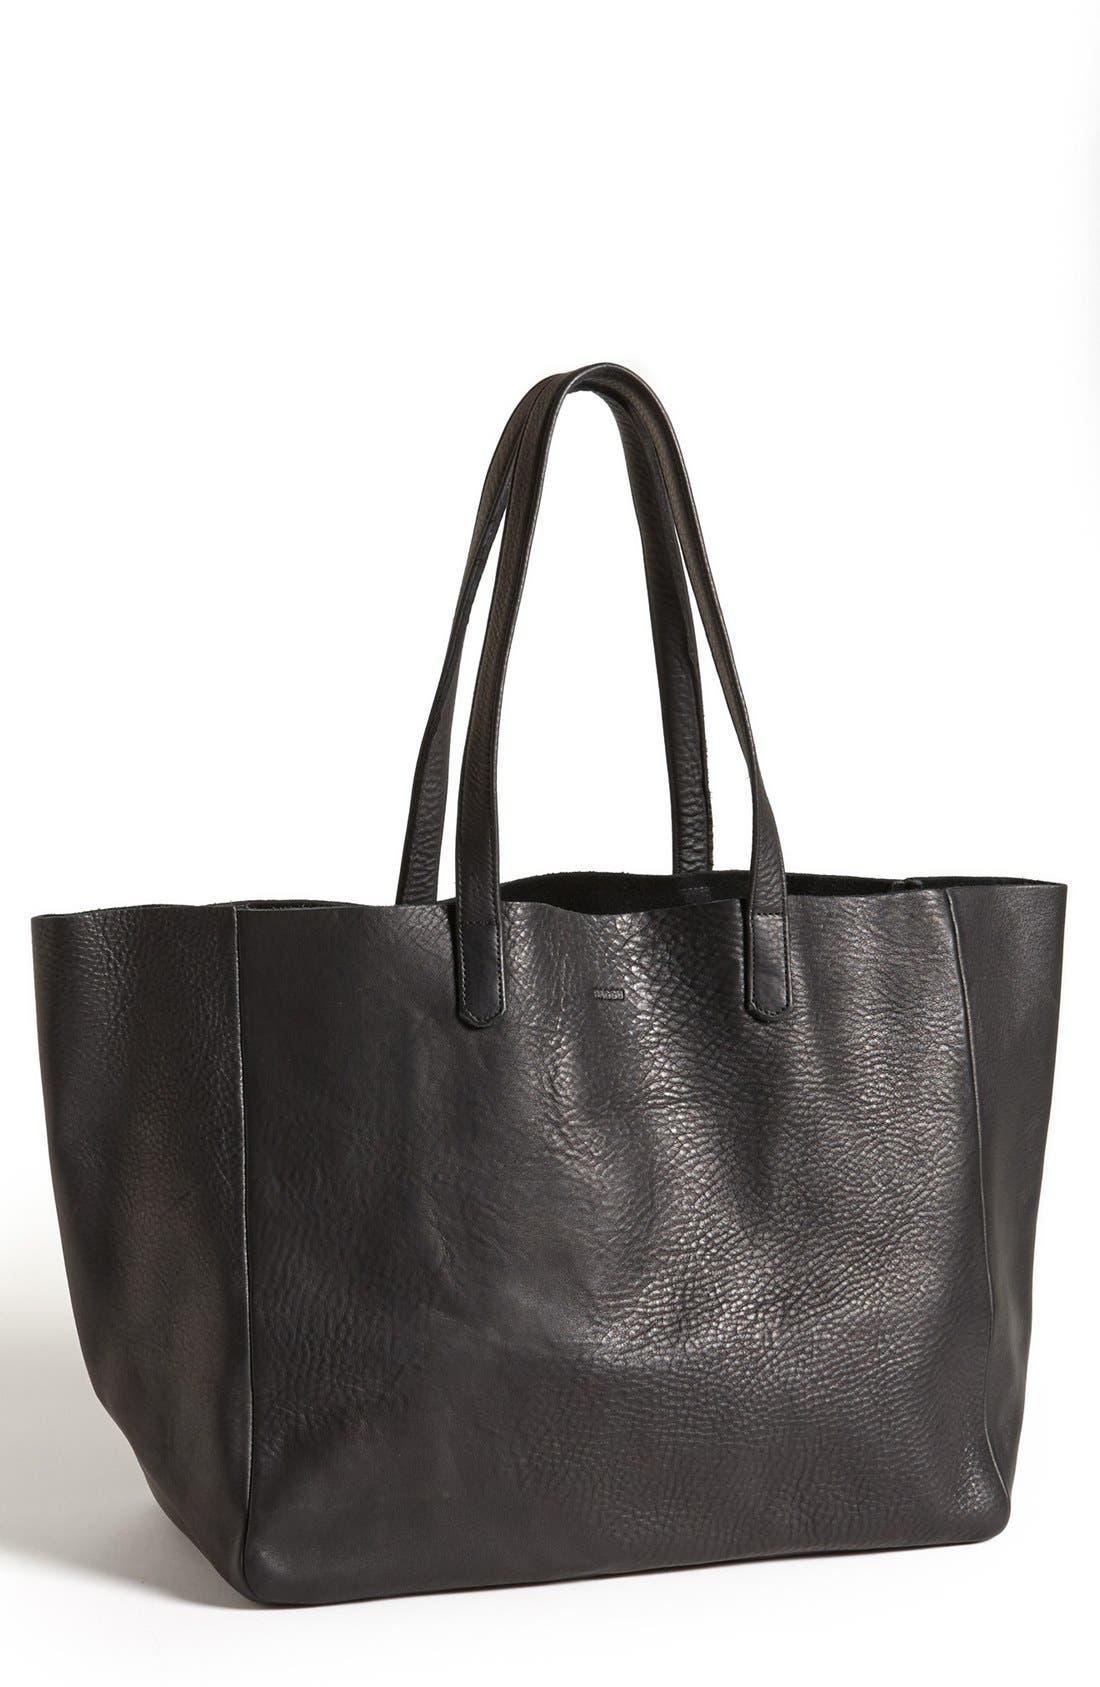 Main Image - Baggu Leather Tote